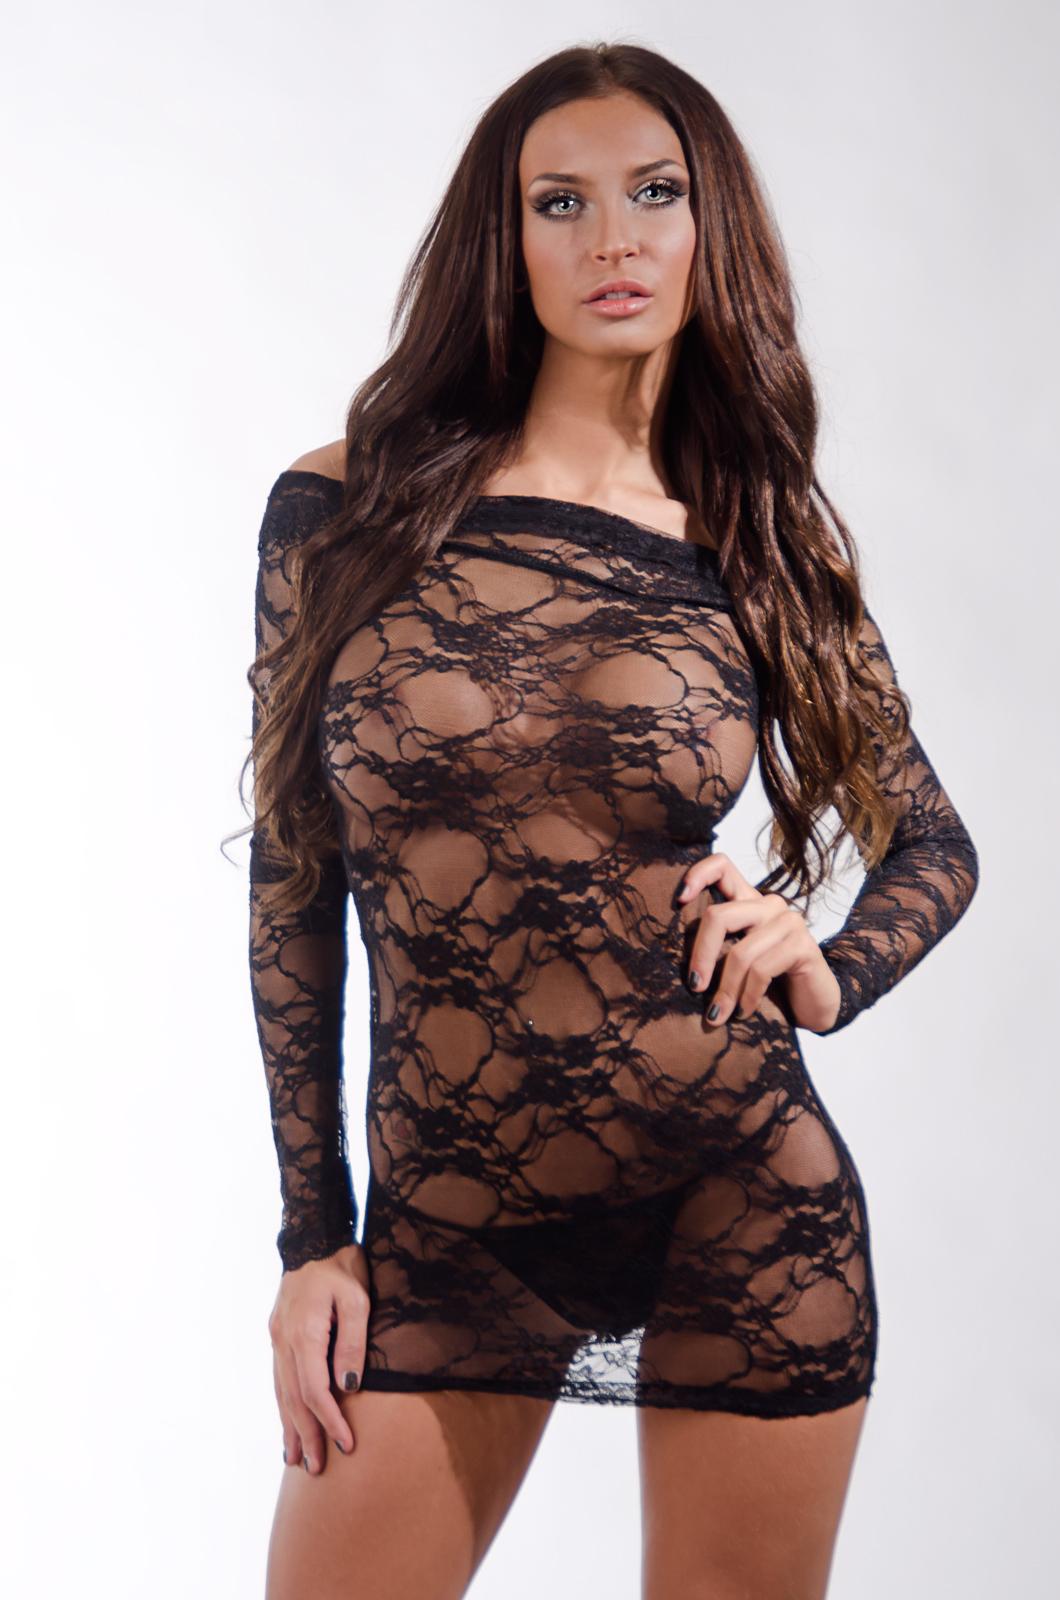 svart korsett sexiga underkläder xxl